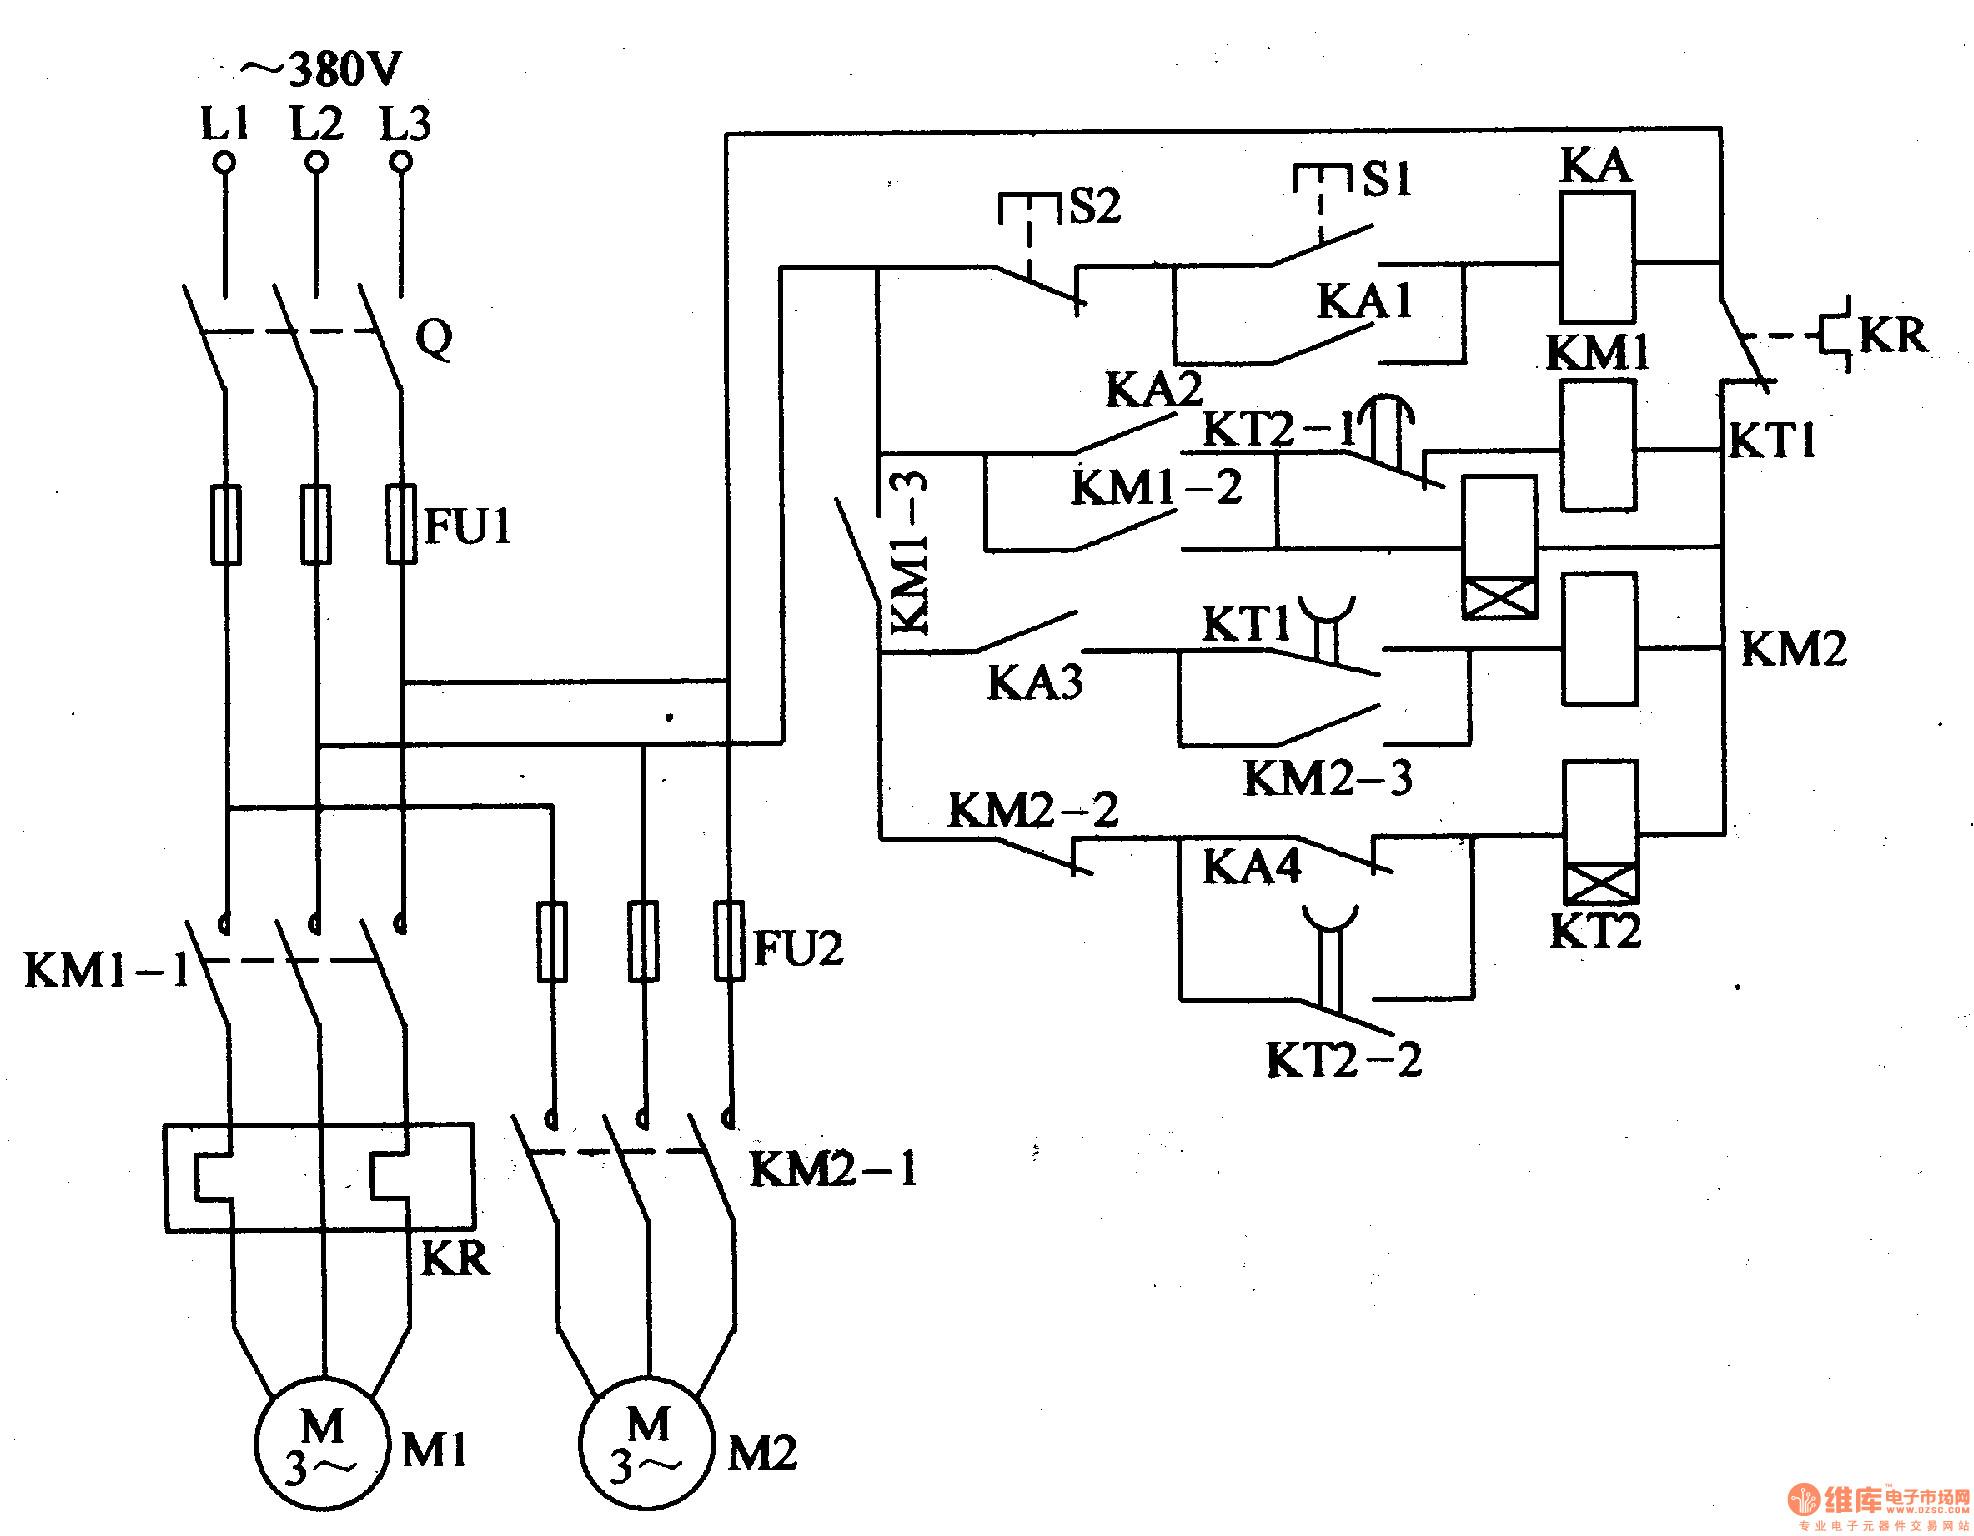 Control Panel Wiring Diagram Pdf Inspirational Electronic Circuit - Electrical Wiring Diagram Pdf